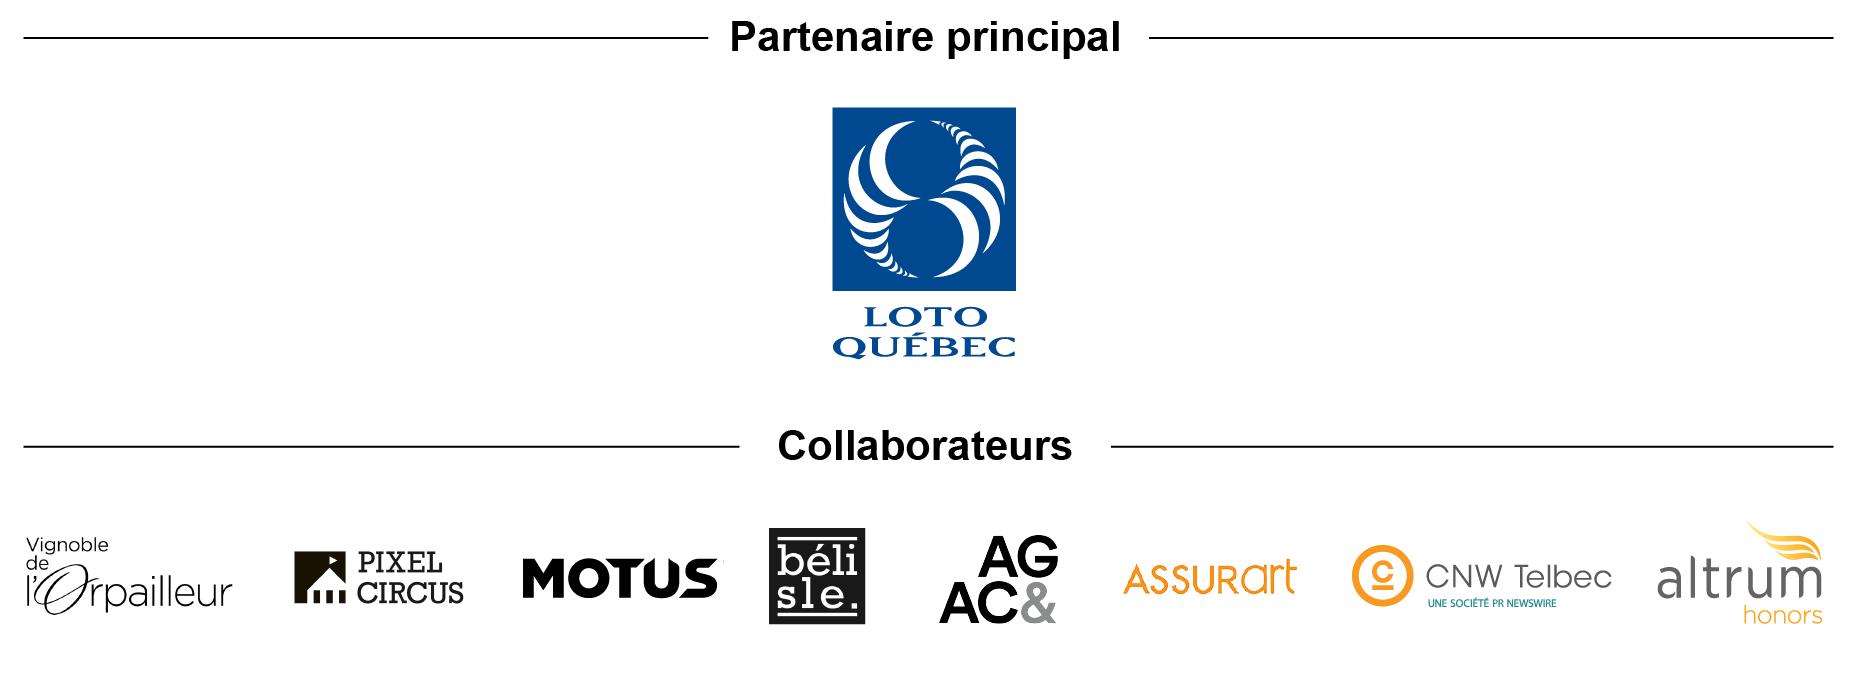 Logos des partenaires du Rallye des galeries 2018